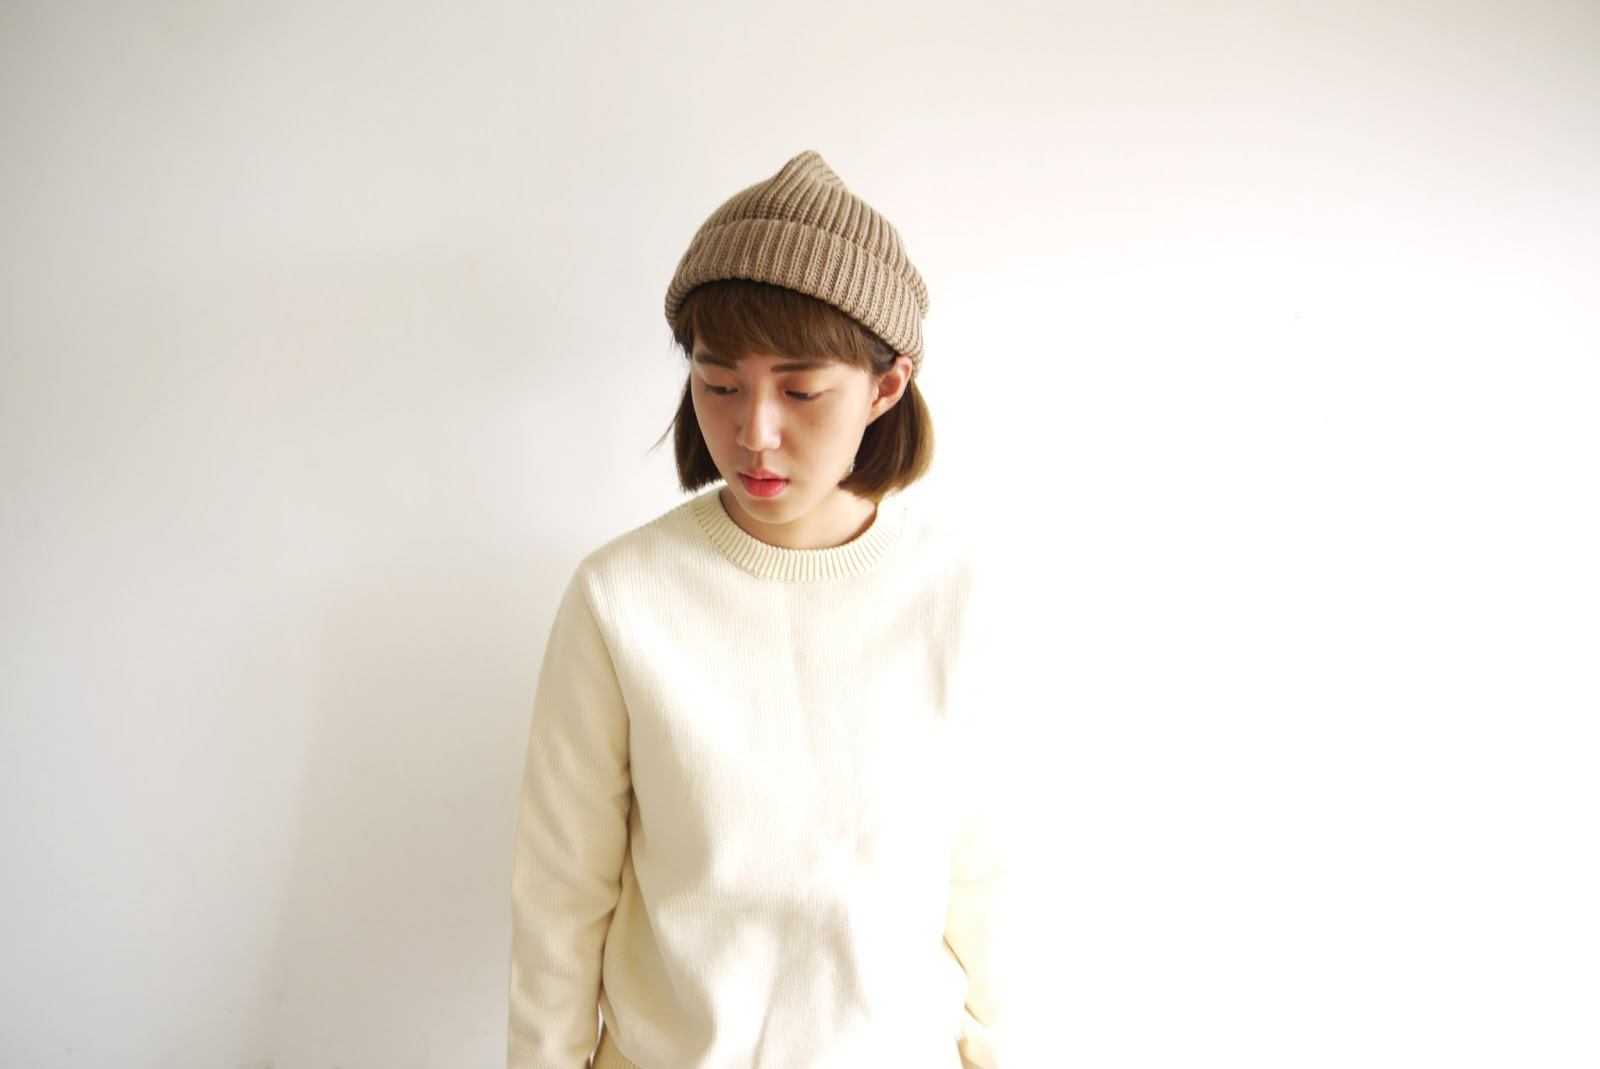 http   washida.bigcartel.com product universal-works-rib-beanie-14836 4405dba879e